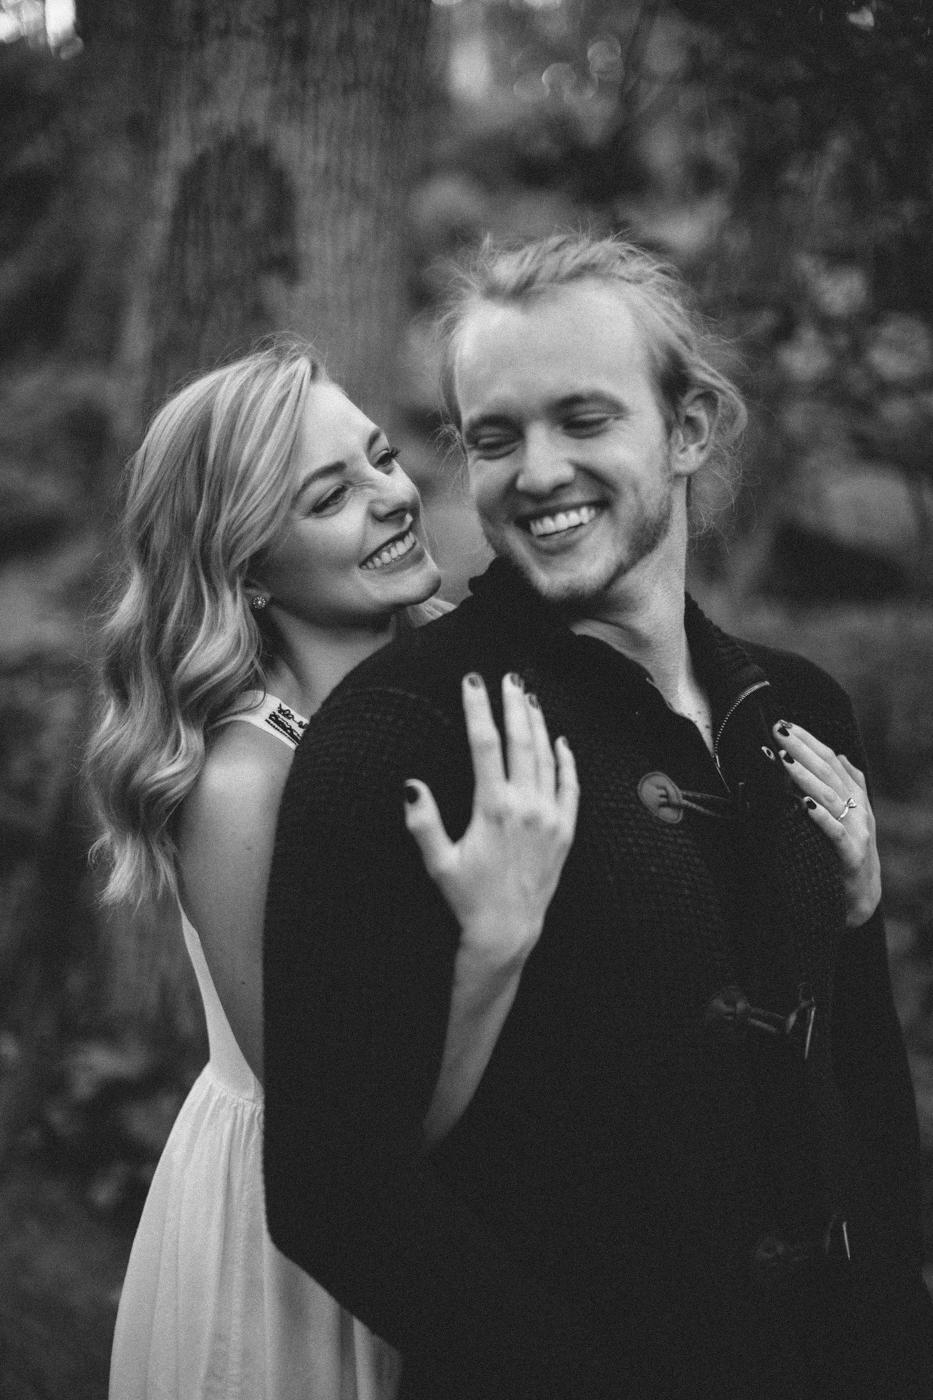 Sioux_Falls_Des_Moines_Engagement_Wedding_Photographer_14.jpg